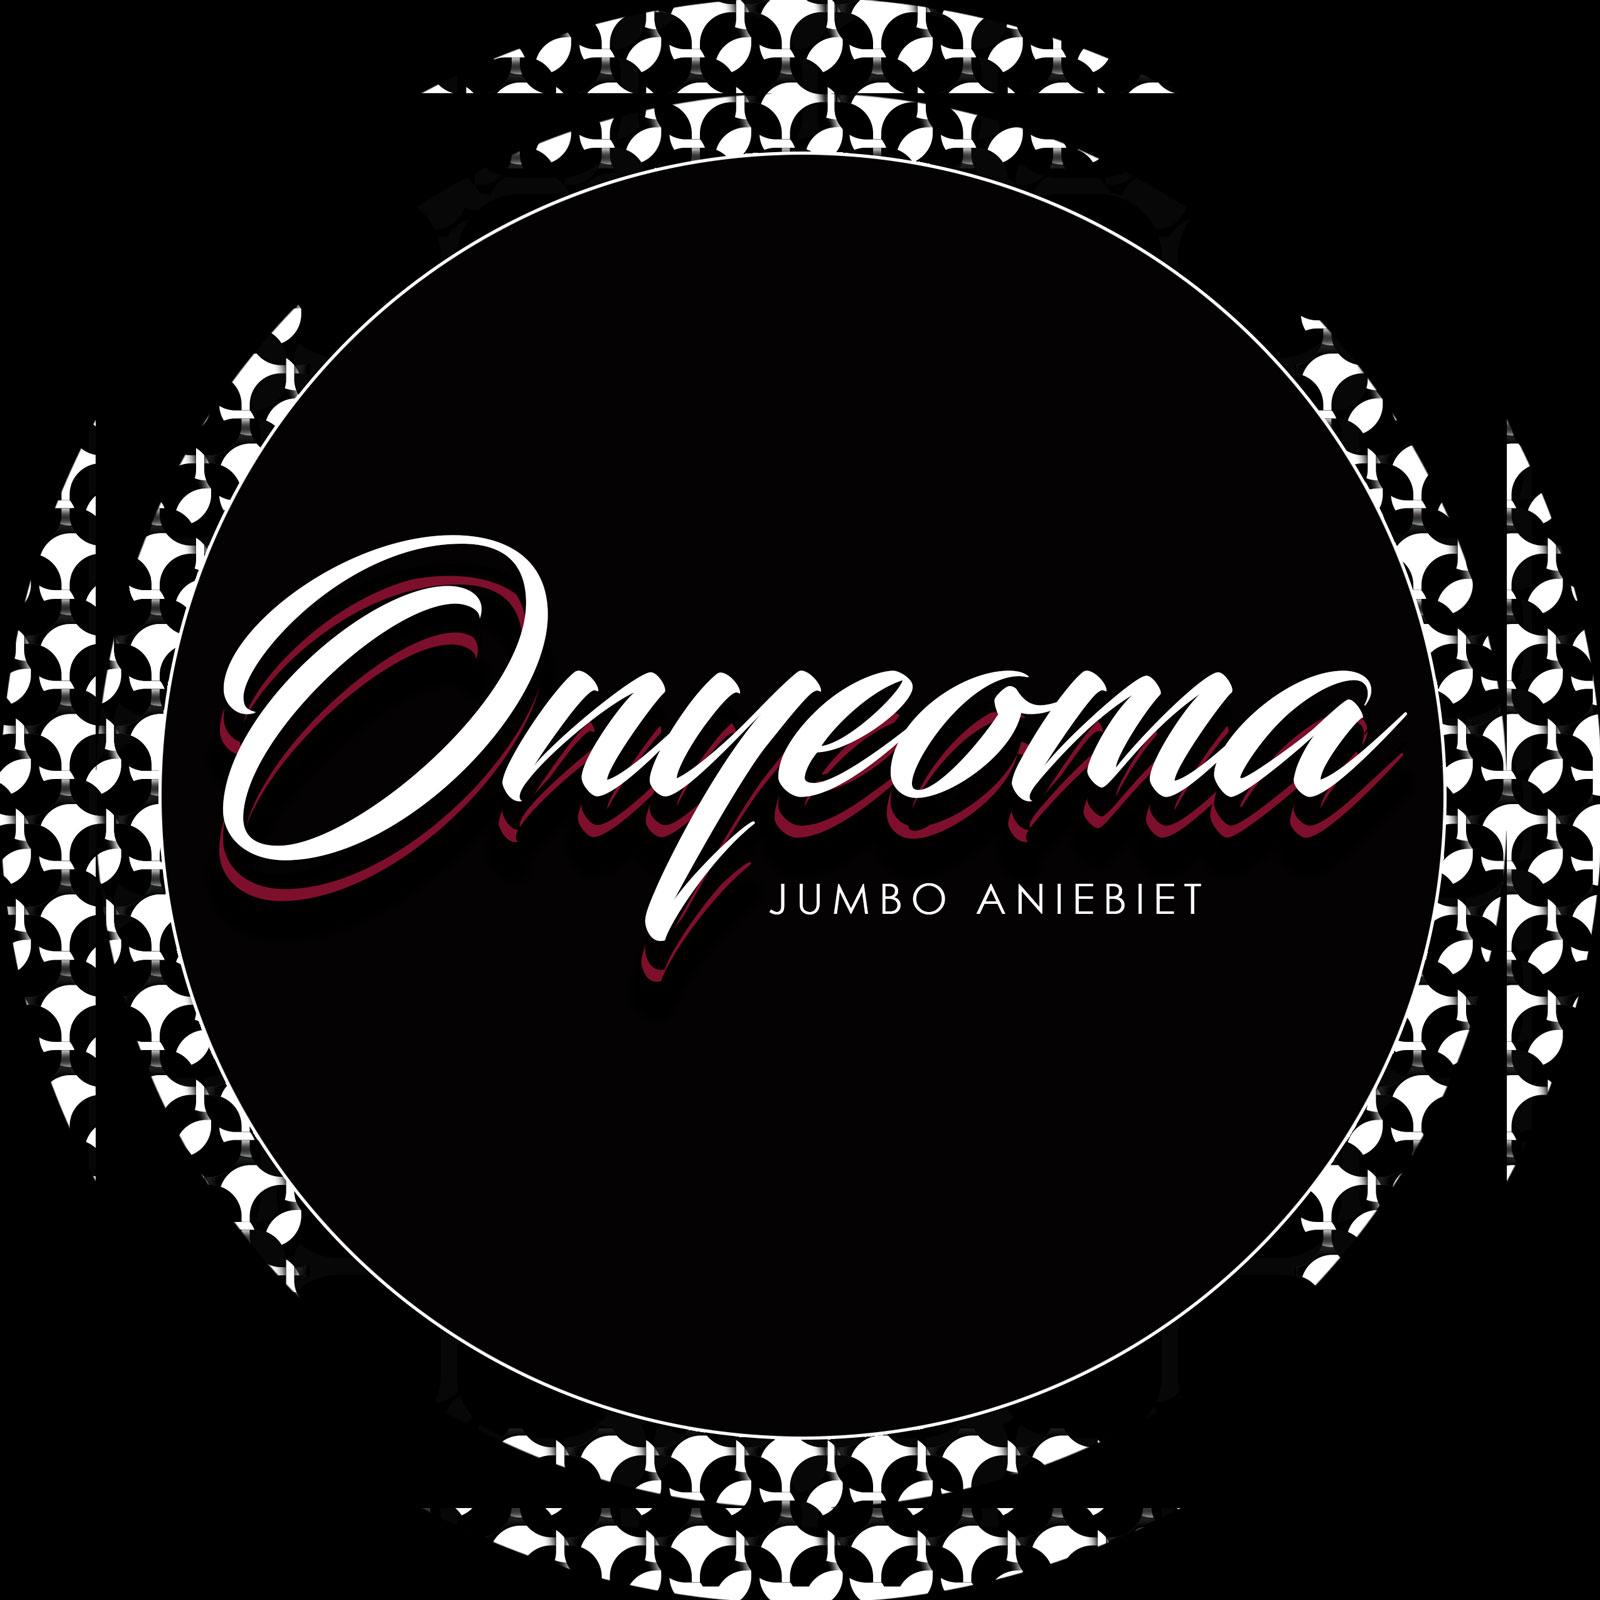 DOWNLOAD: Jumbo Aniebiet - Onyeoma Ft. Jessi Alvarez [Mp3 + Video]